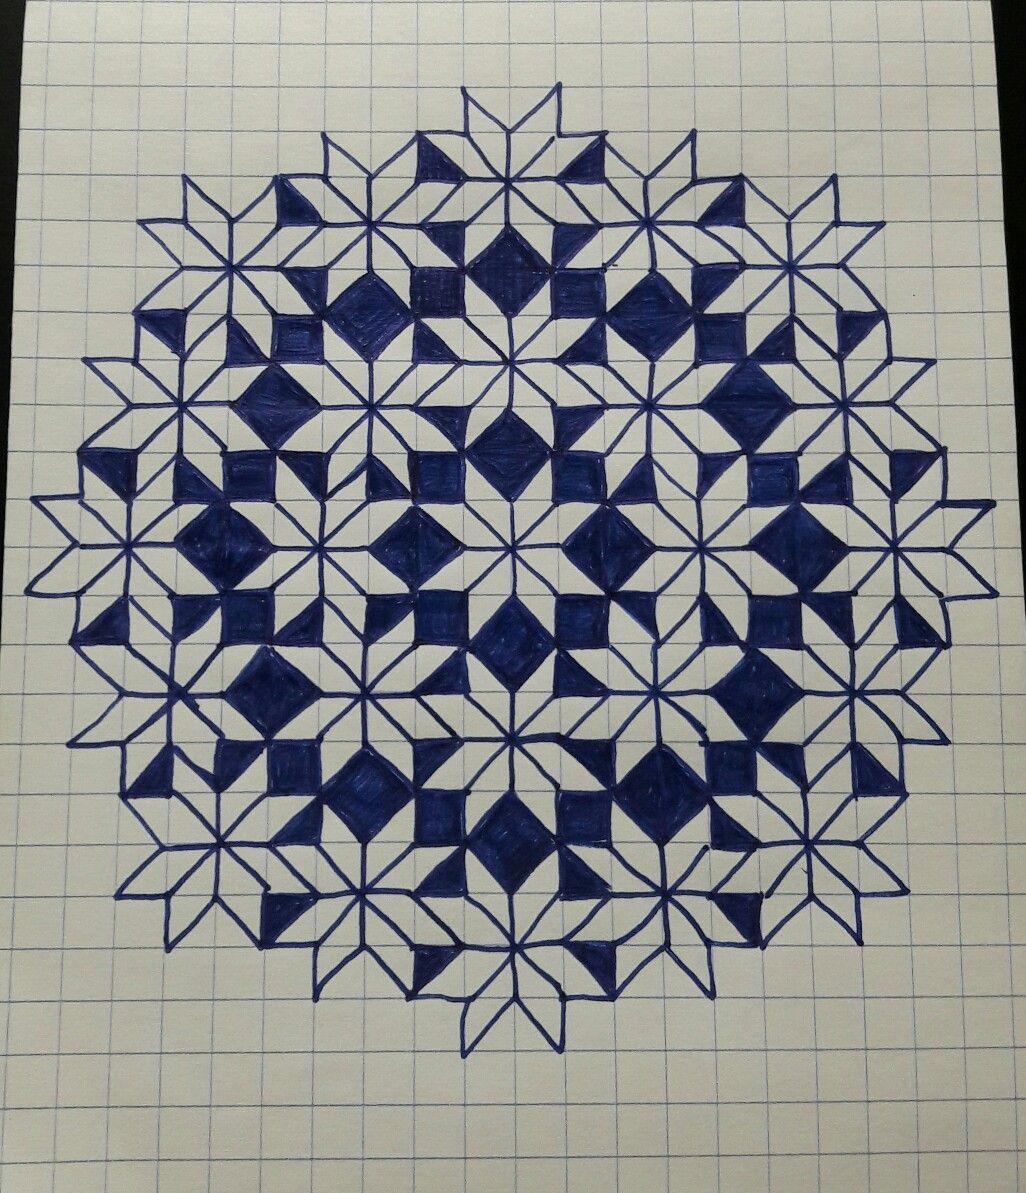 geometric designs on graph paper juve cenitdelacabrera co